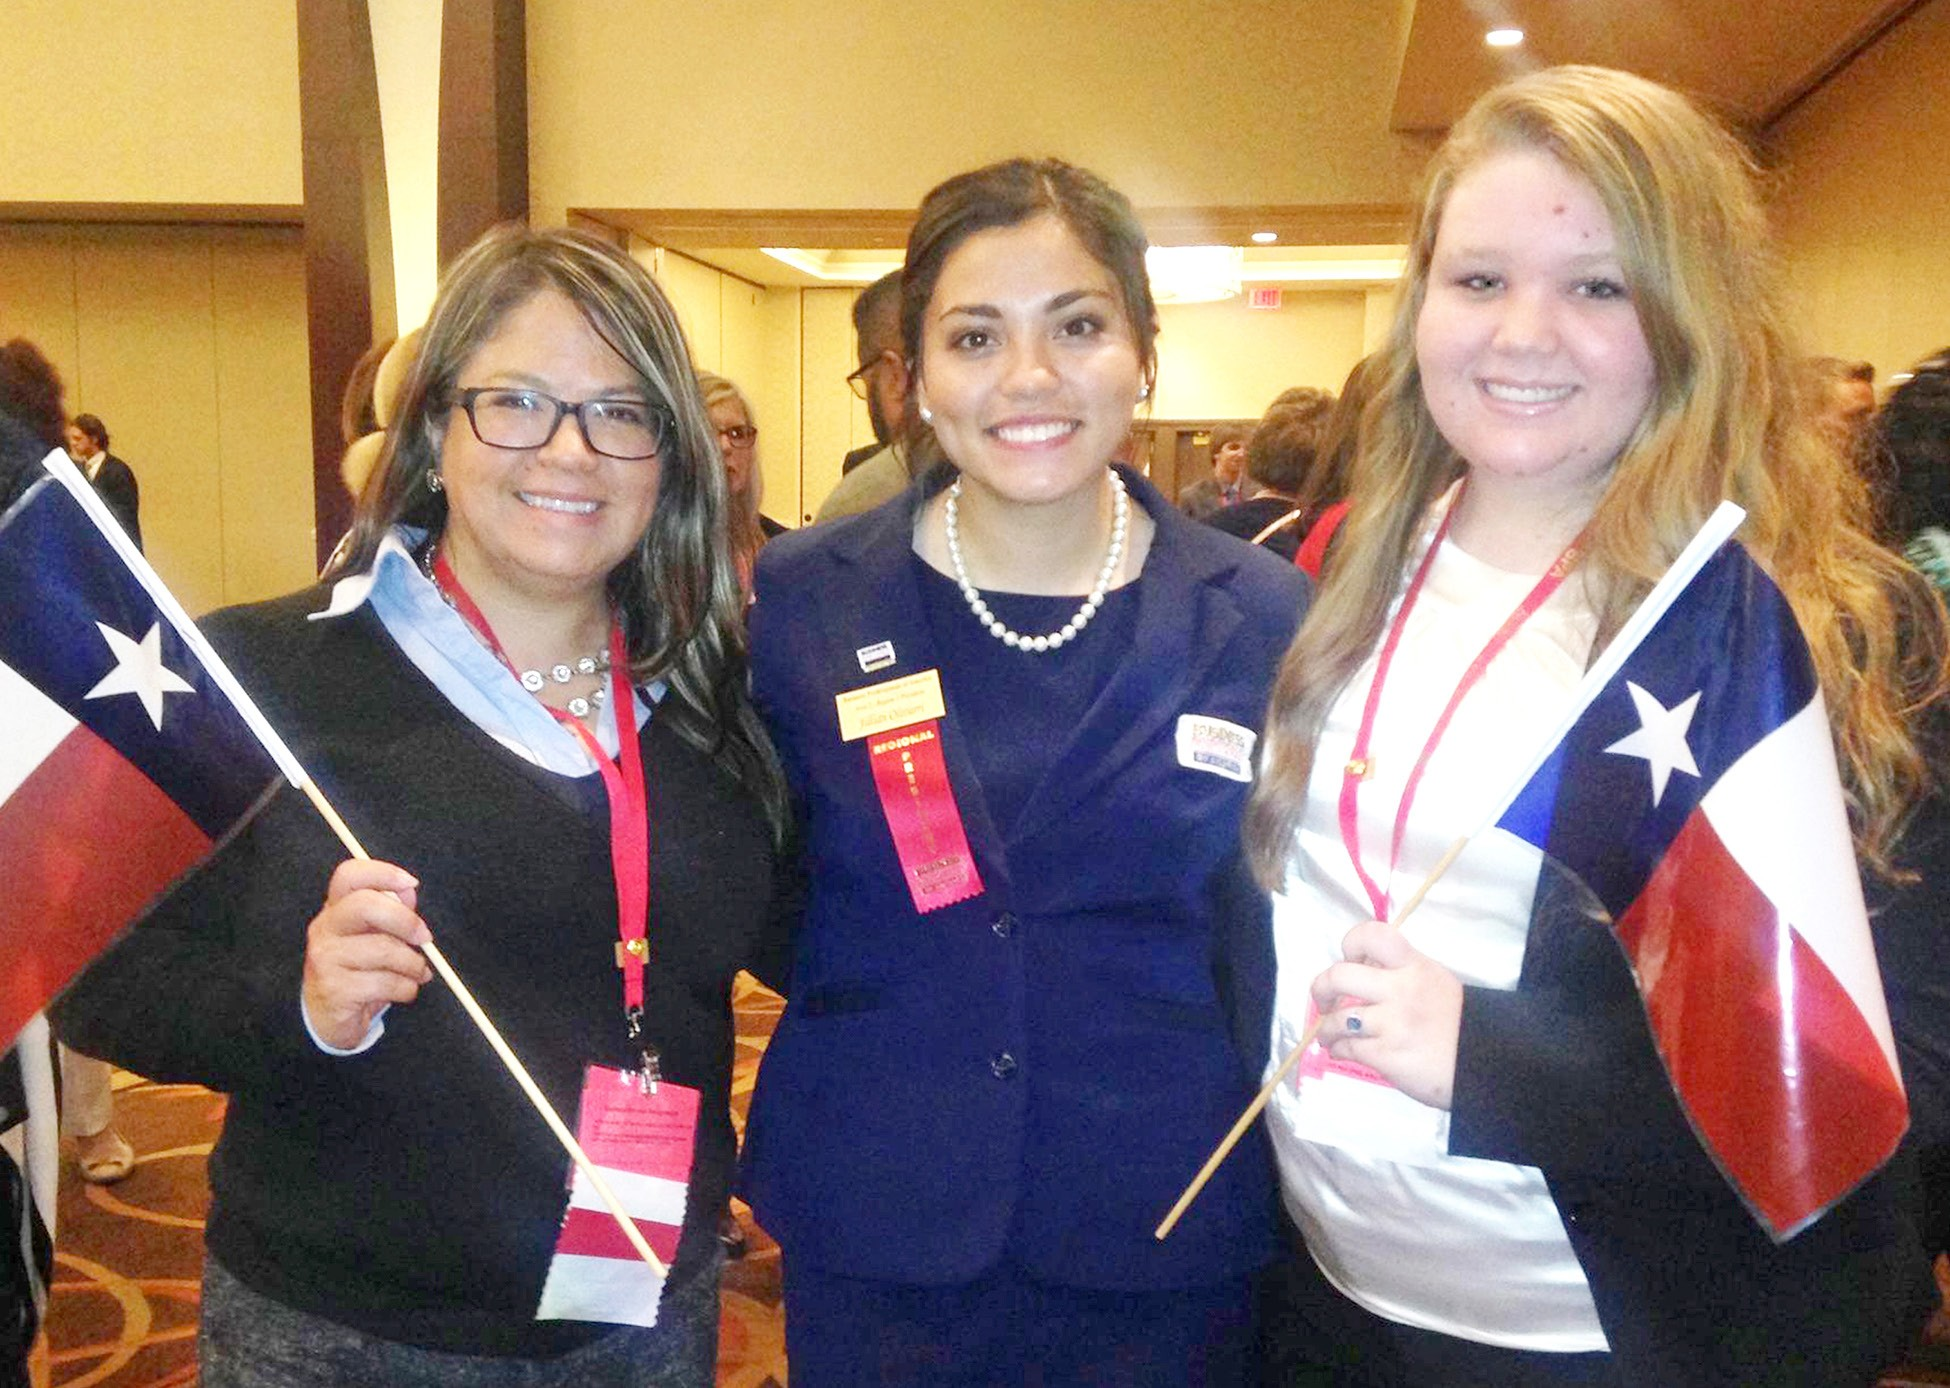 Janie Olivarri, Jillian Olivarri and Alyssa Dickson represent Pleasanton High School at the National Leadership Conference in Boston, Mass.